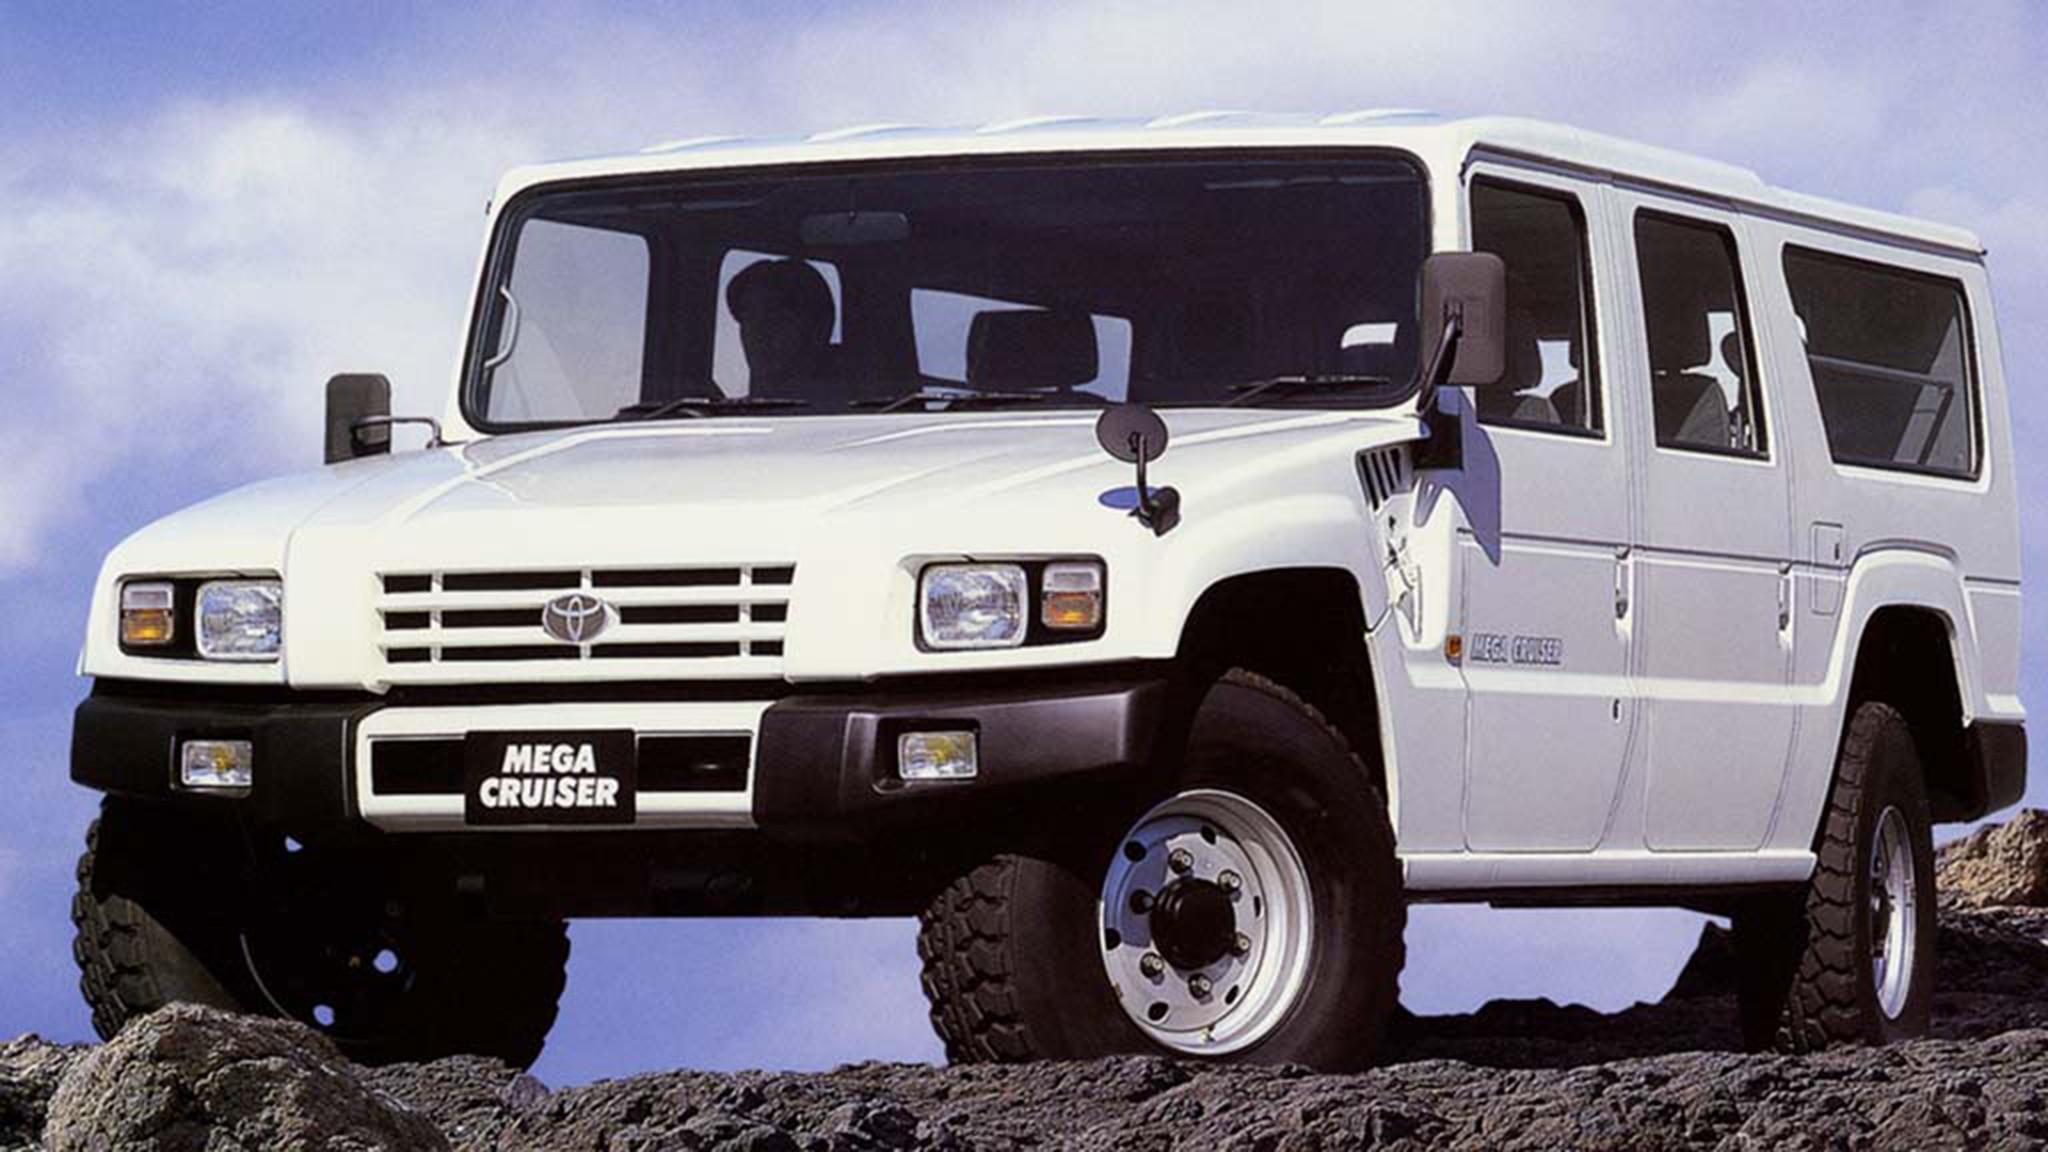 Toyota Mega Cruiser SUV: History of Japan's Hummer | Automobile